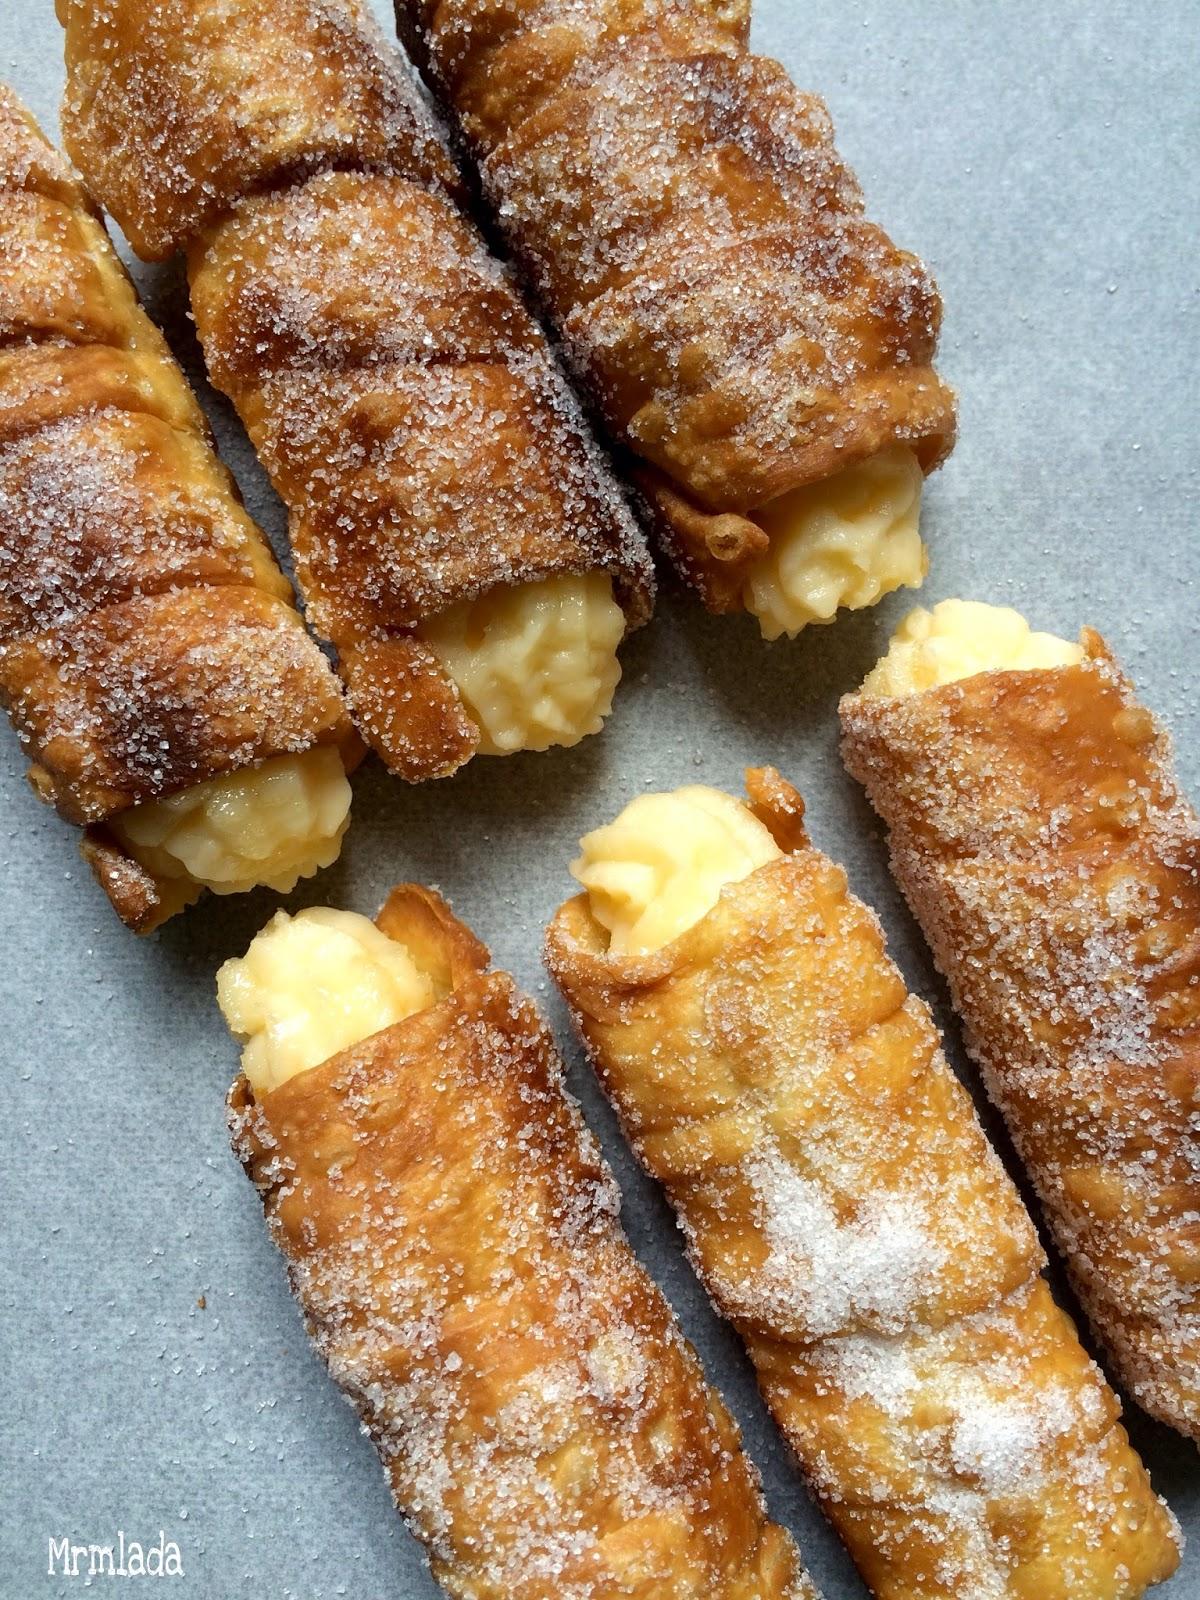 Canutillos de Bilbao con crema pastelera  Reto Reposteras